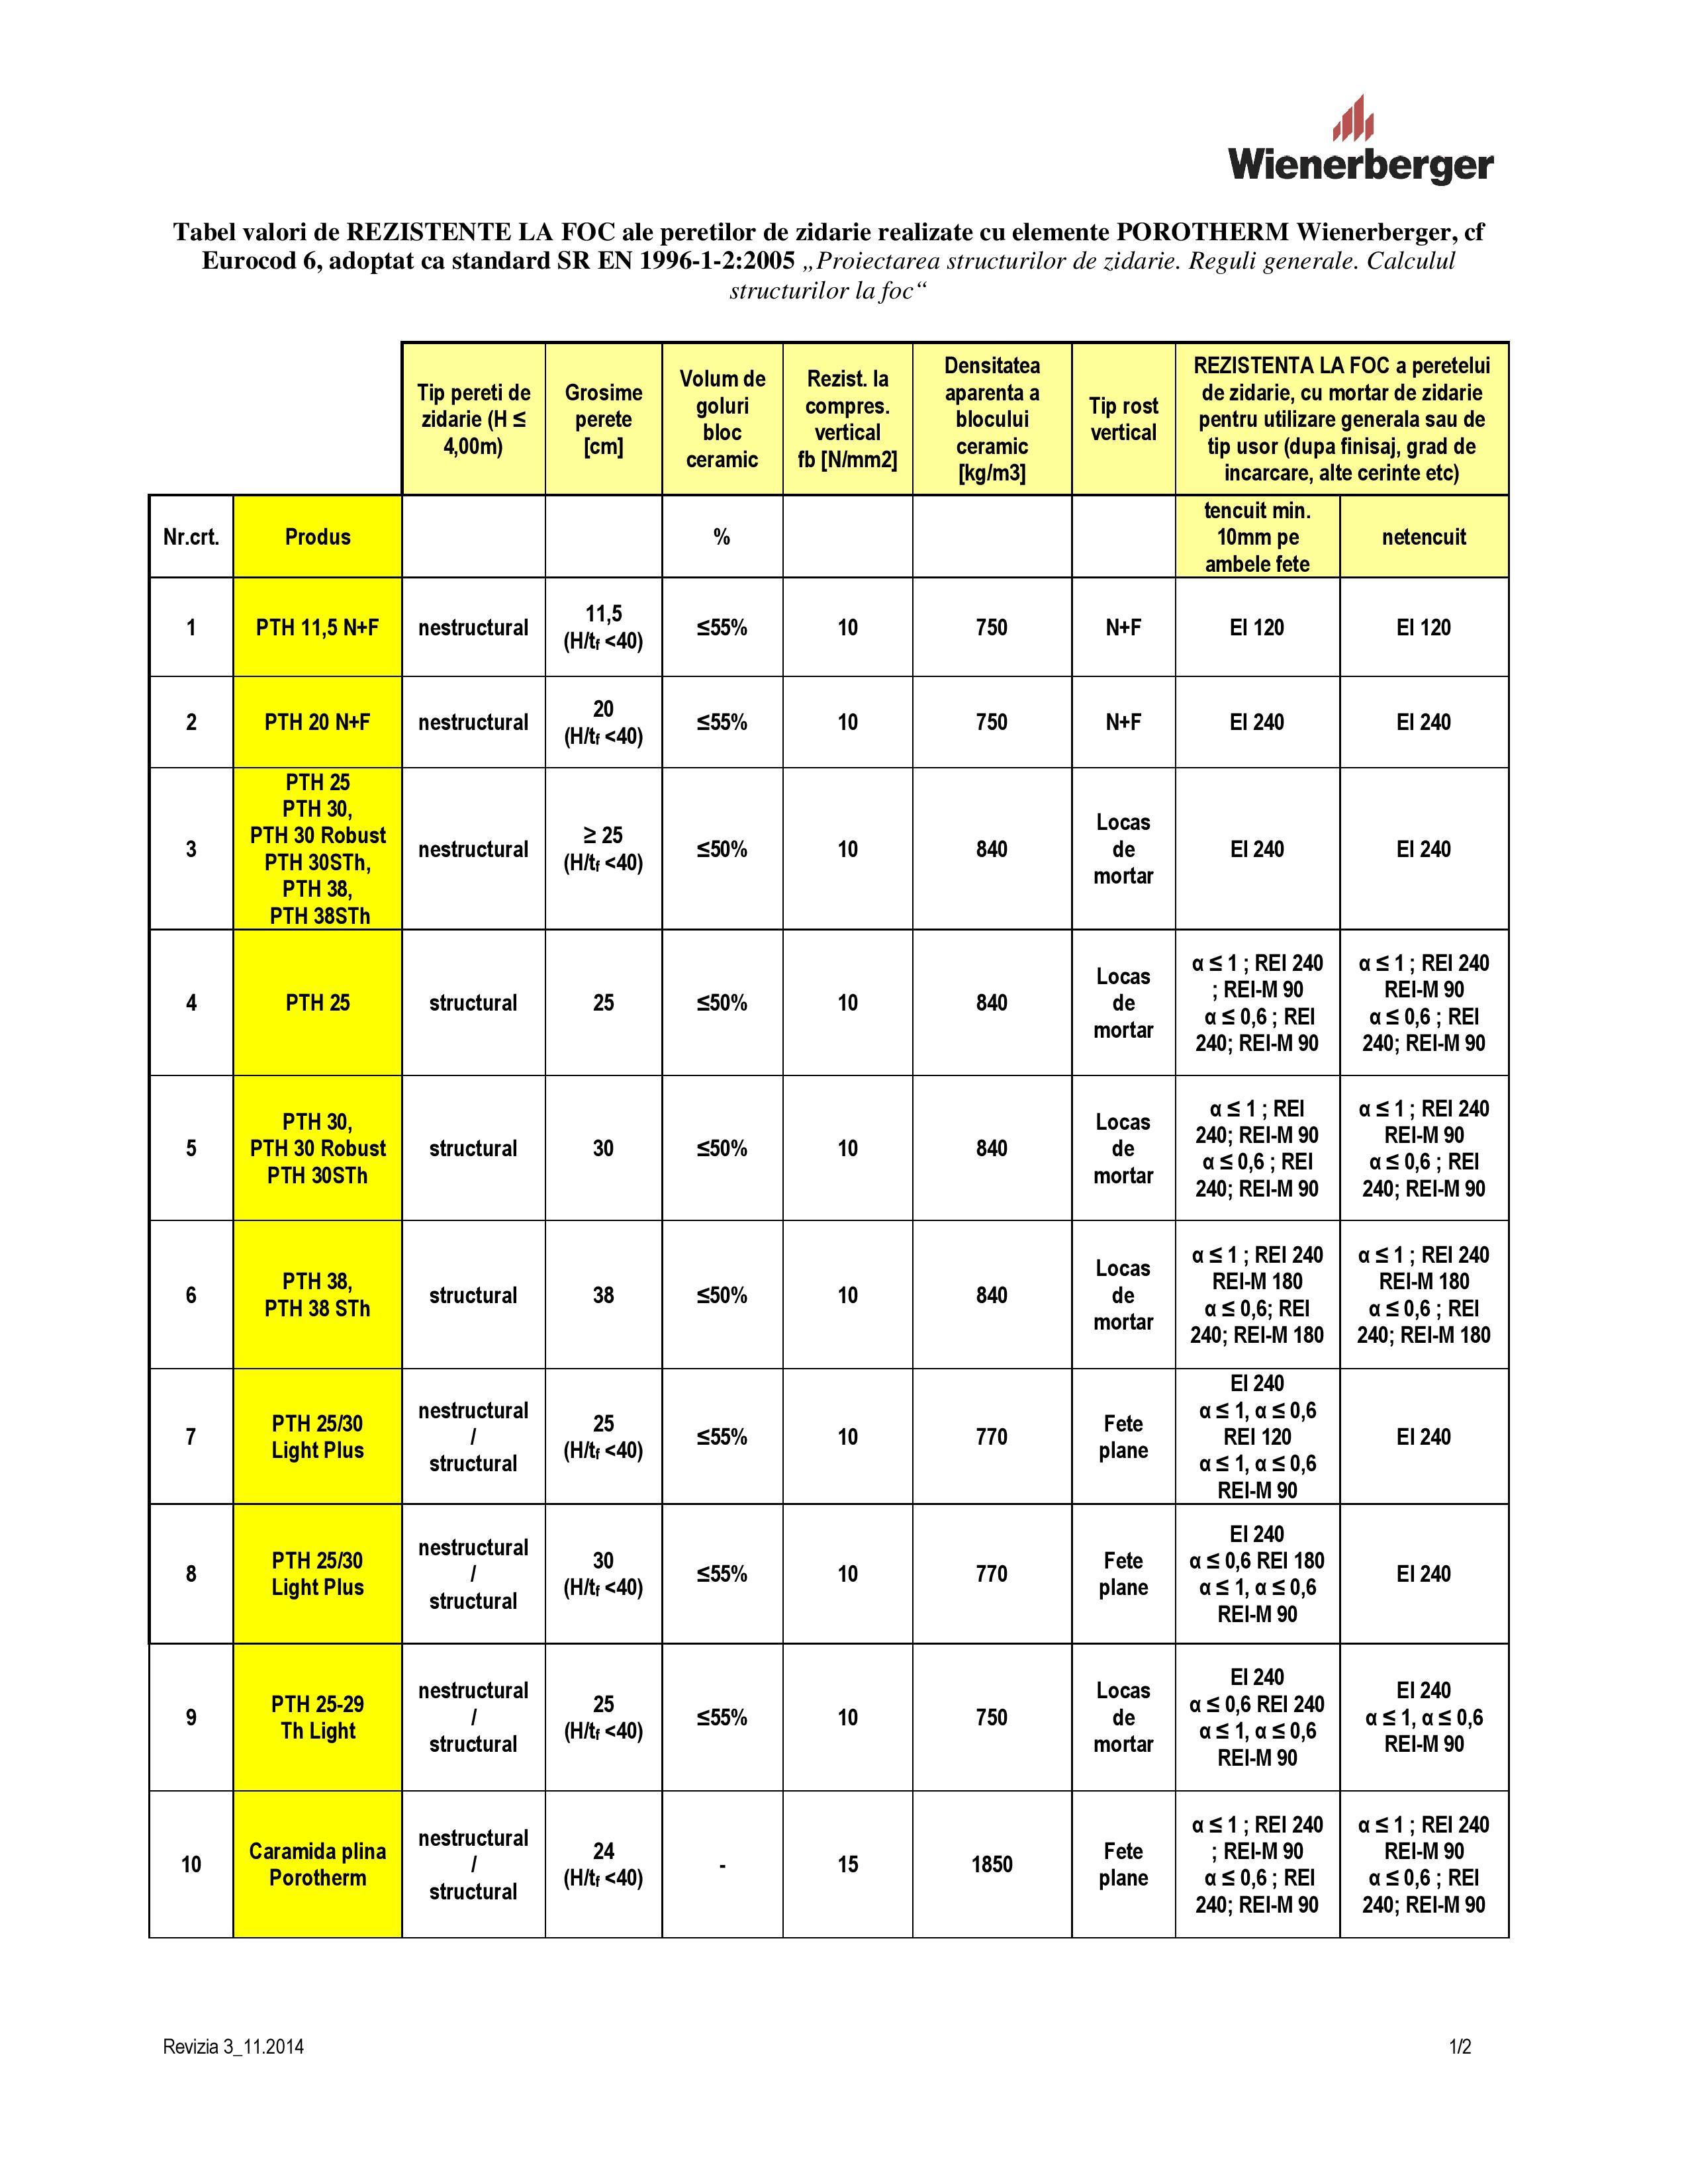 rezistenta_la_foc_03-11-2014-pereti-caramida-porotherm-page-001